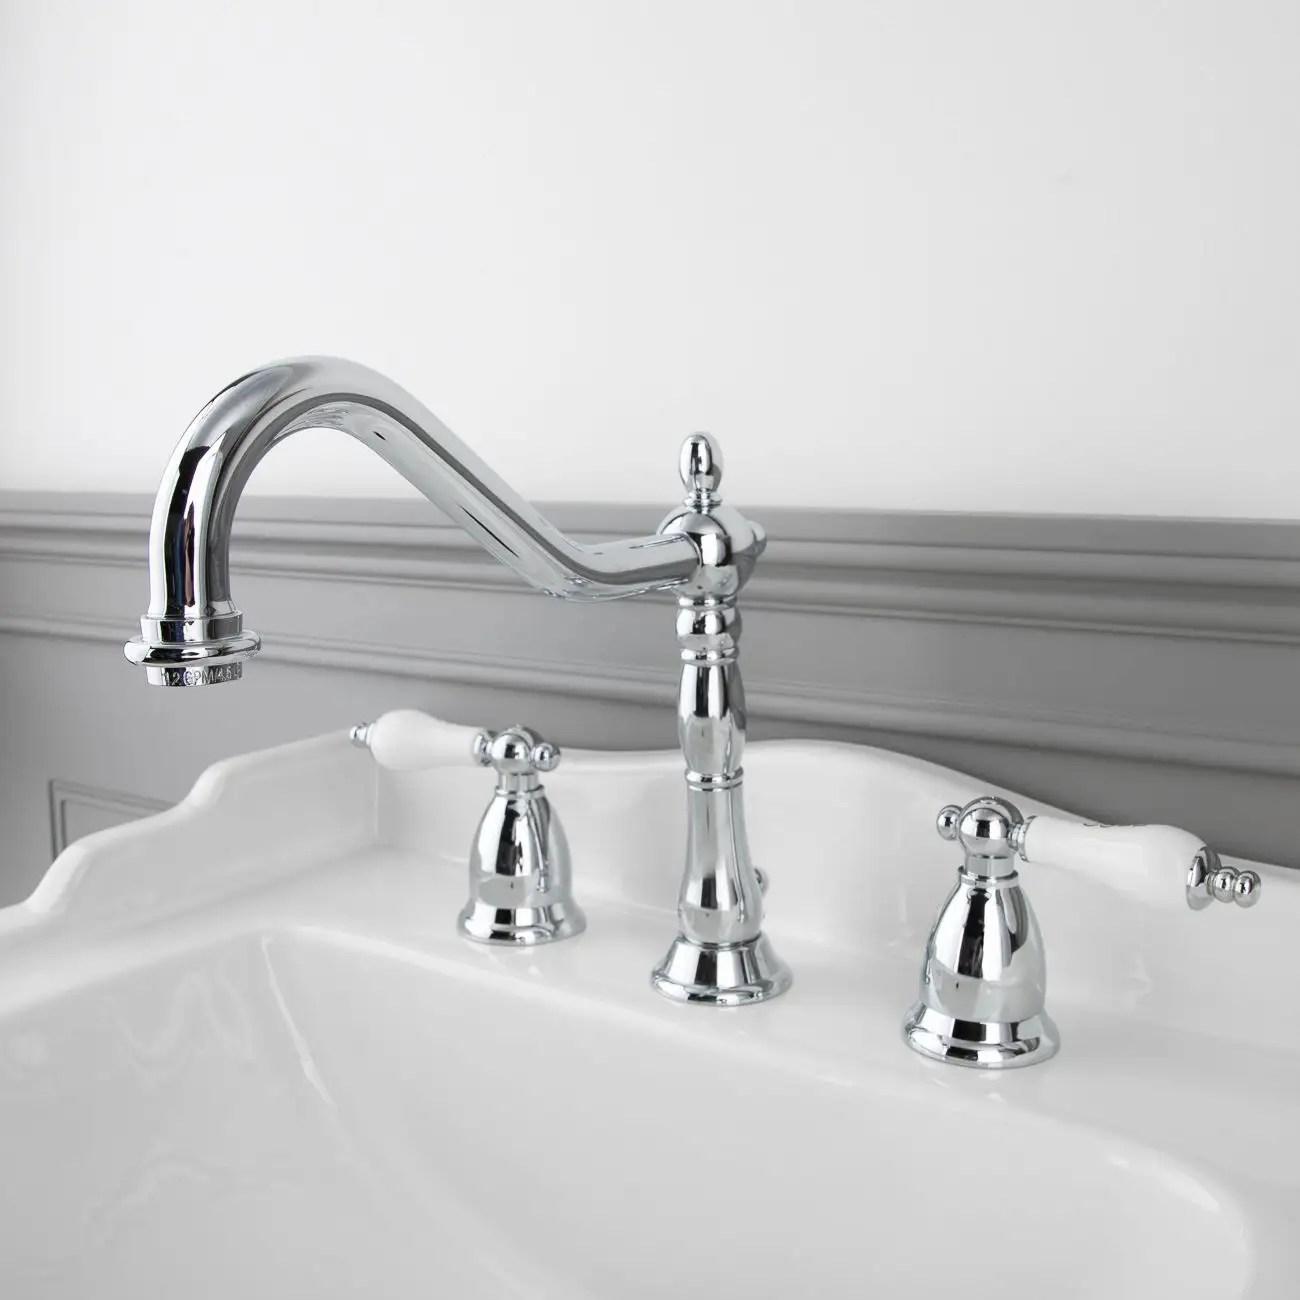 victorian widespread bathroom sink faucet porcelain lever handles